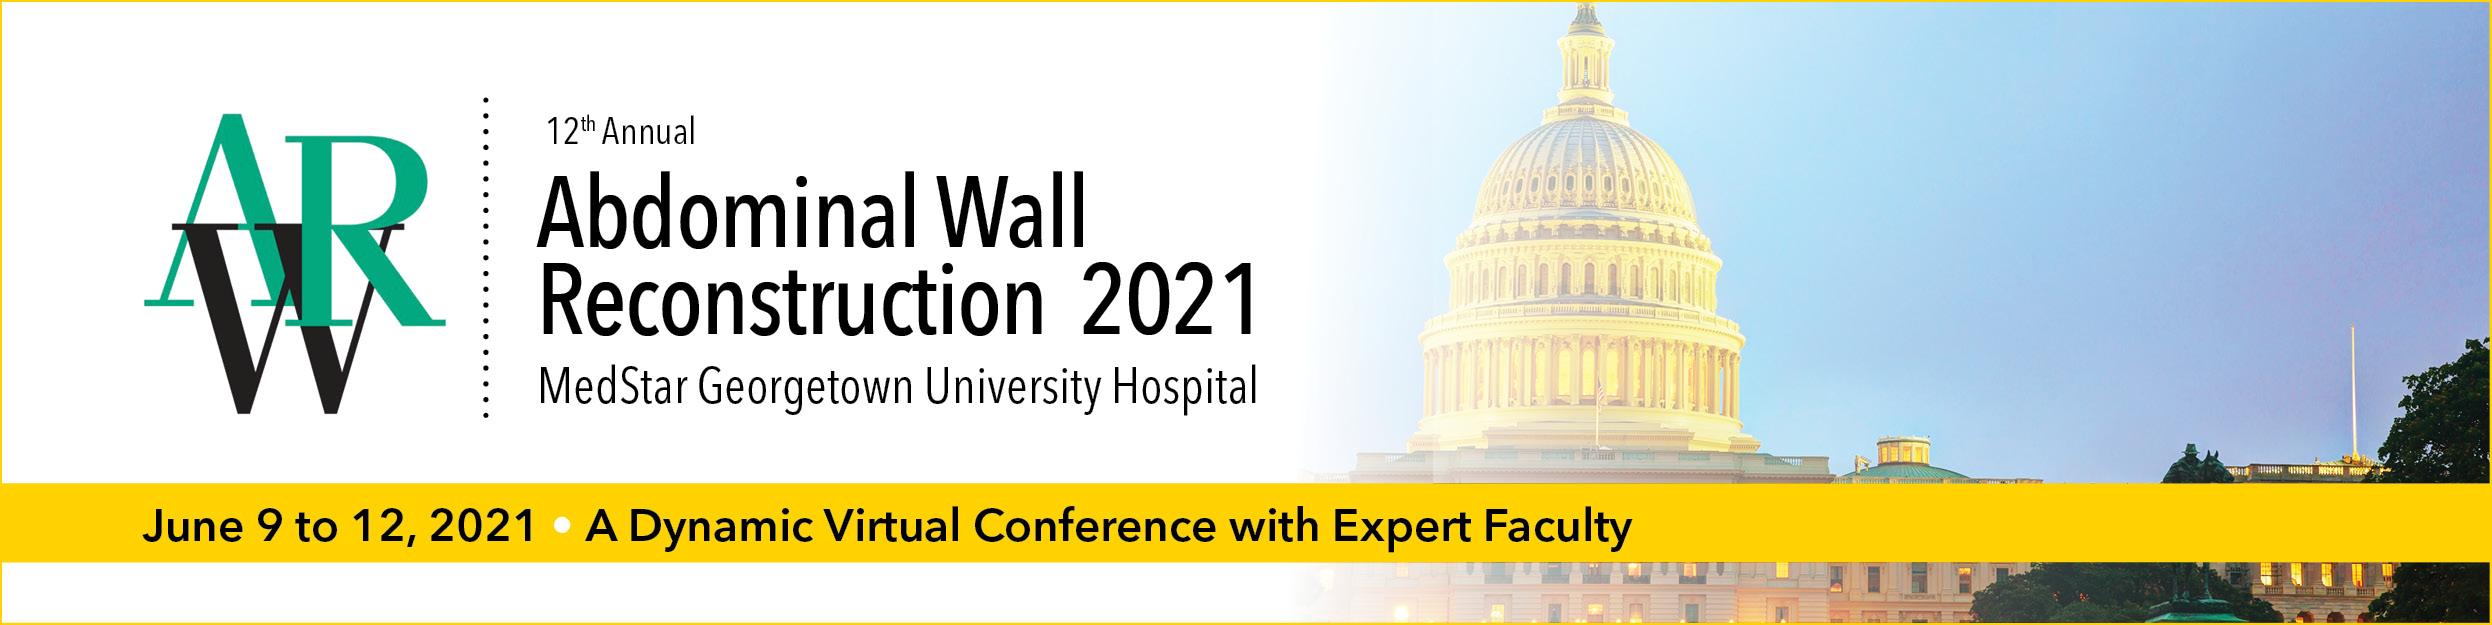 Abdominal Wall Reconstruction (AWR) 2021 - Internet Enduring Material Banner